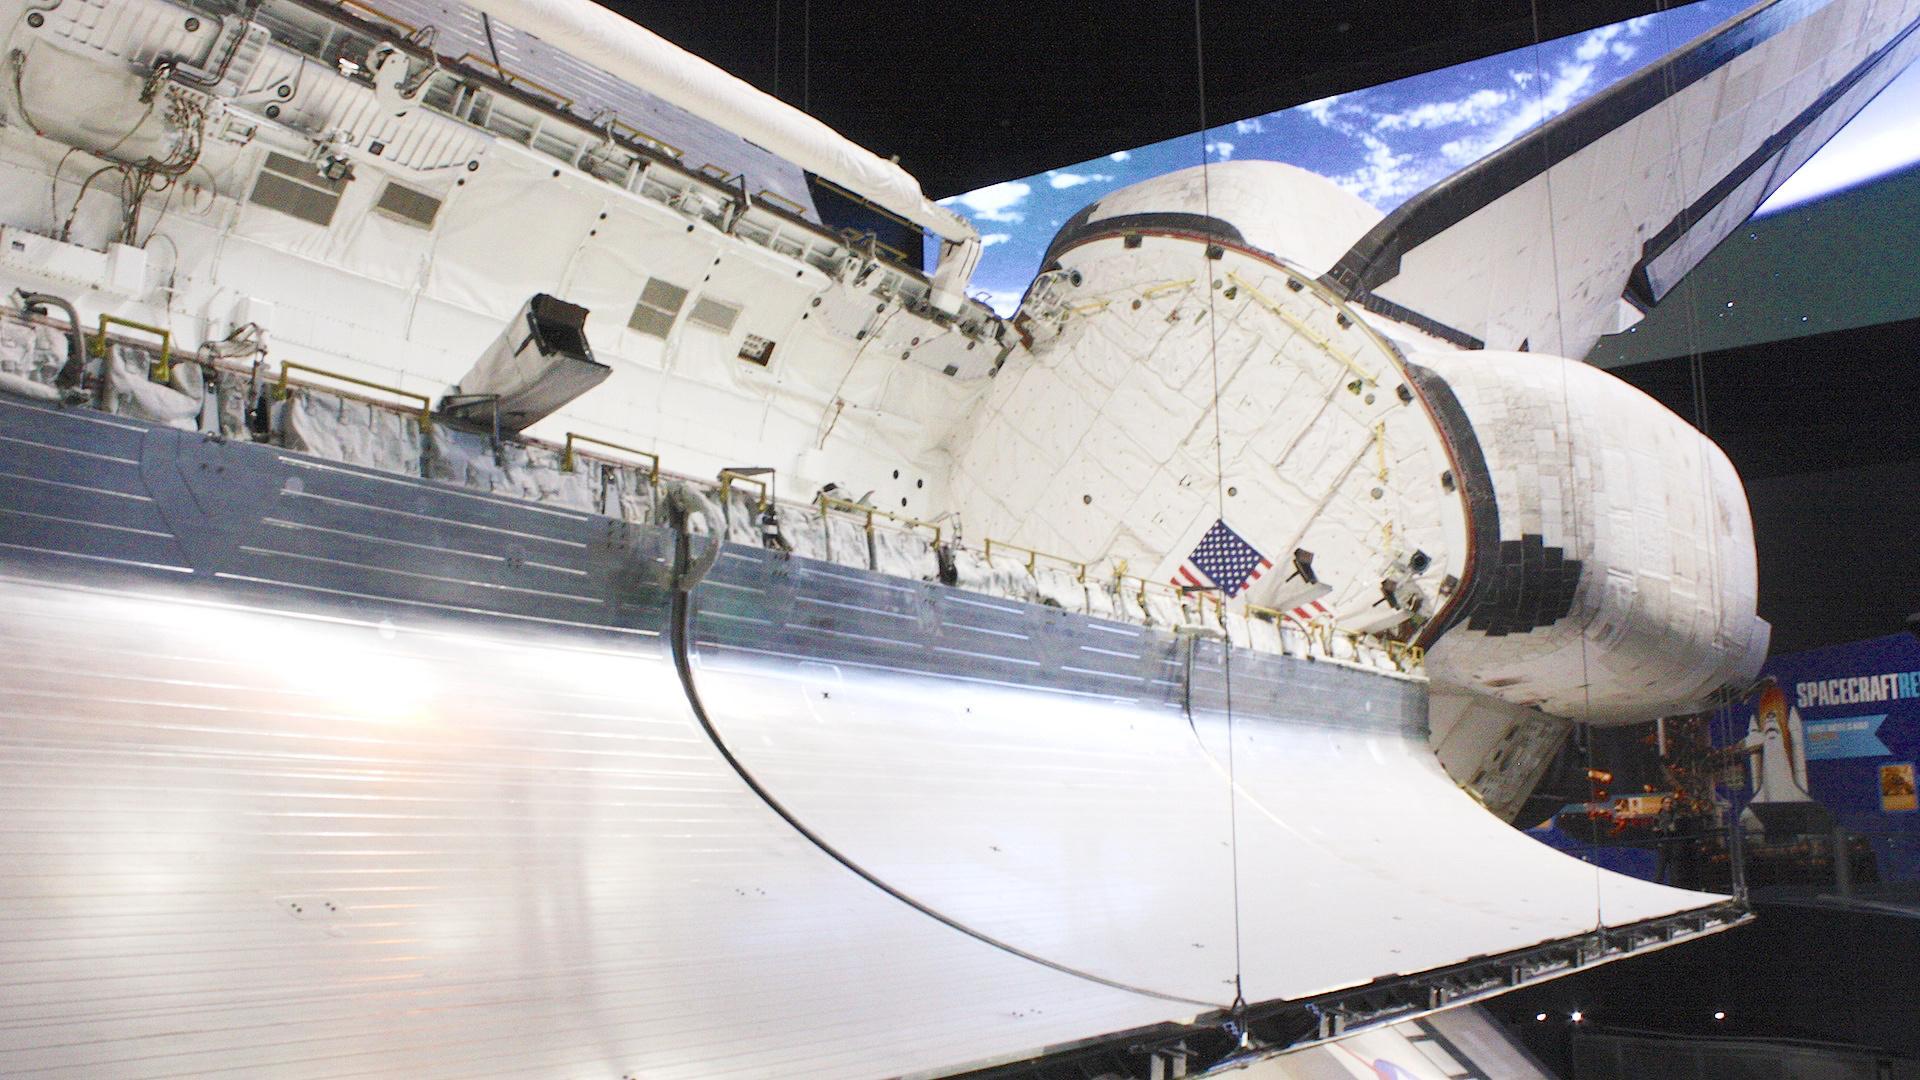 nasa-kennedy-space-center-visitor-ksc-orlando-06102016-in3